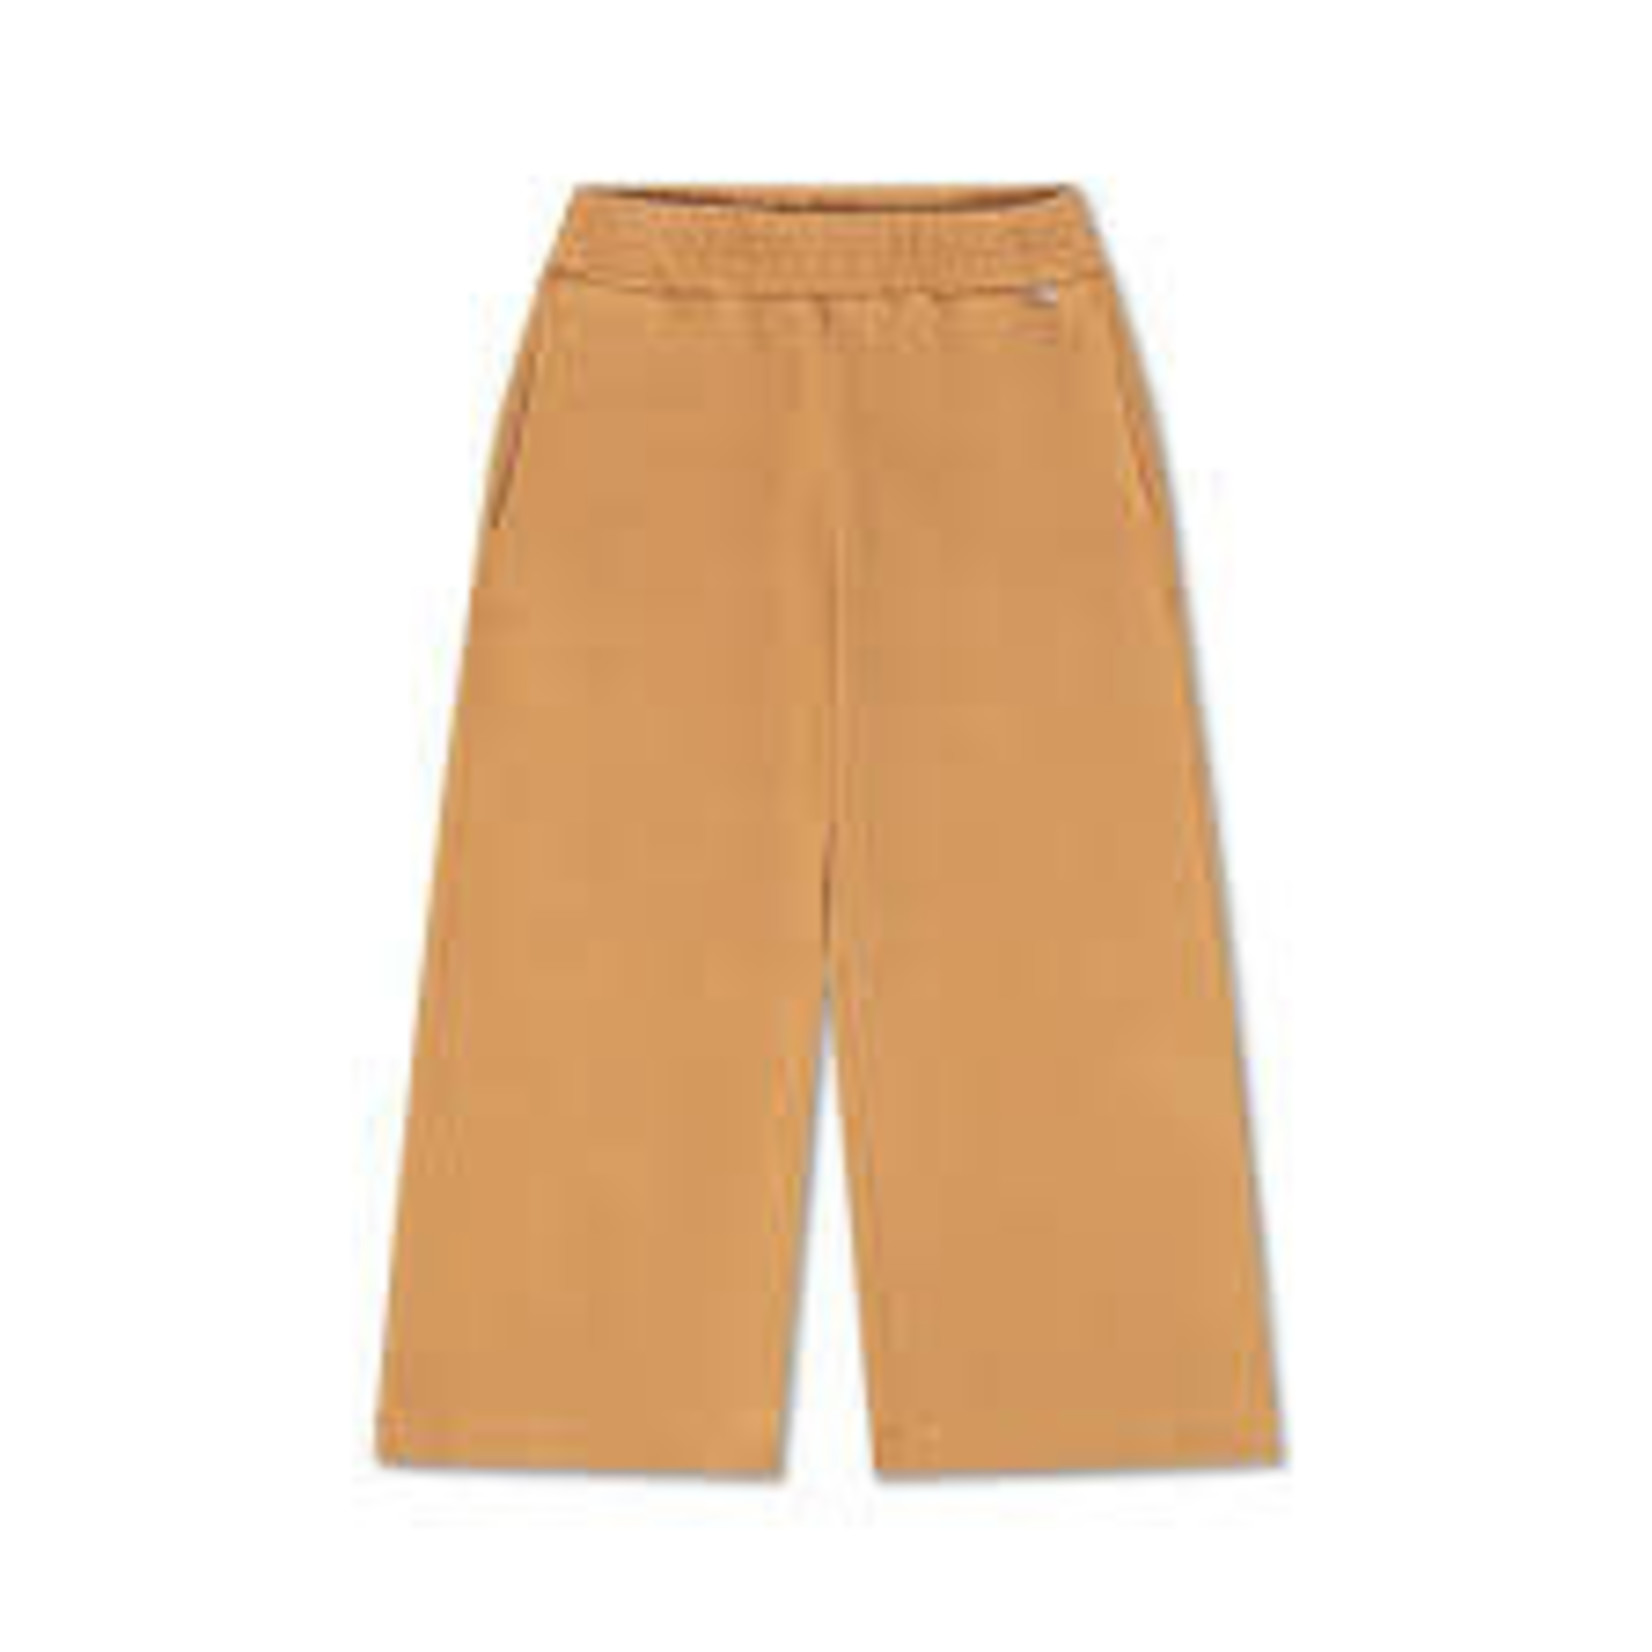 REPOSE AMS REPOSE AMS SALE  comfy pants